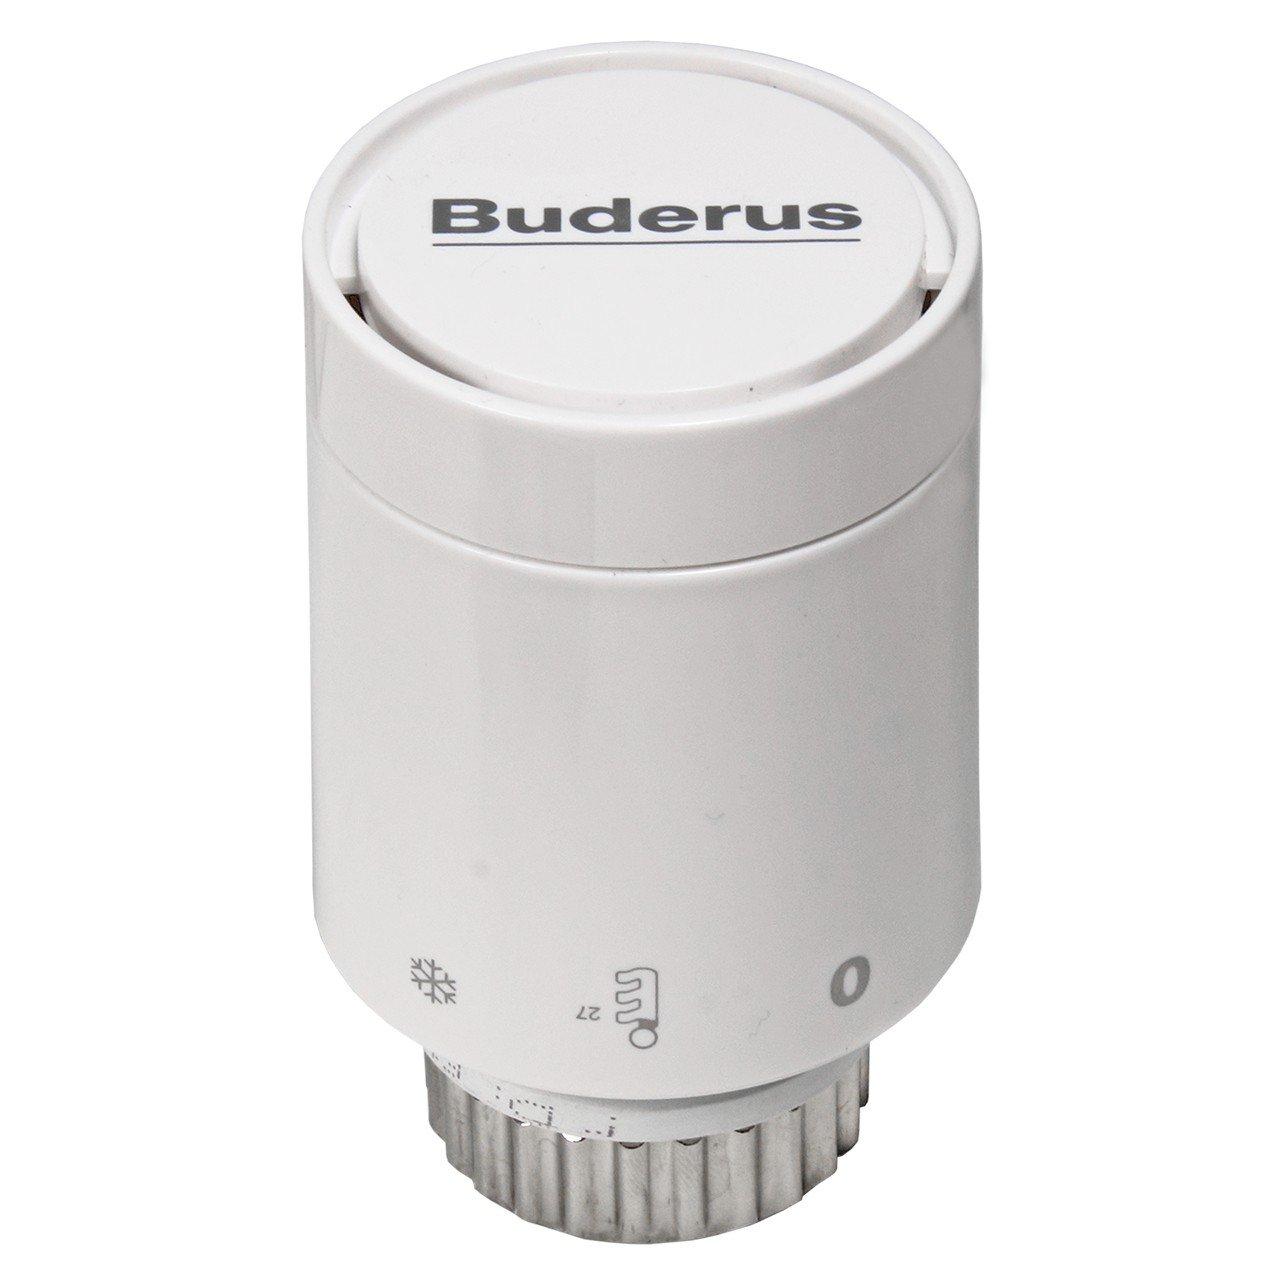 Buderus Logafix cabezal de termostato BH1/de W0/7738306437/para BUDERUS Termostato v/álvulas